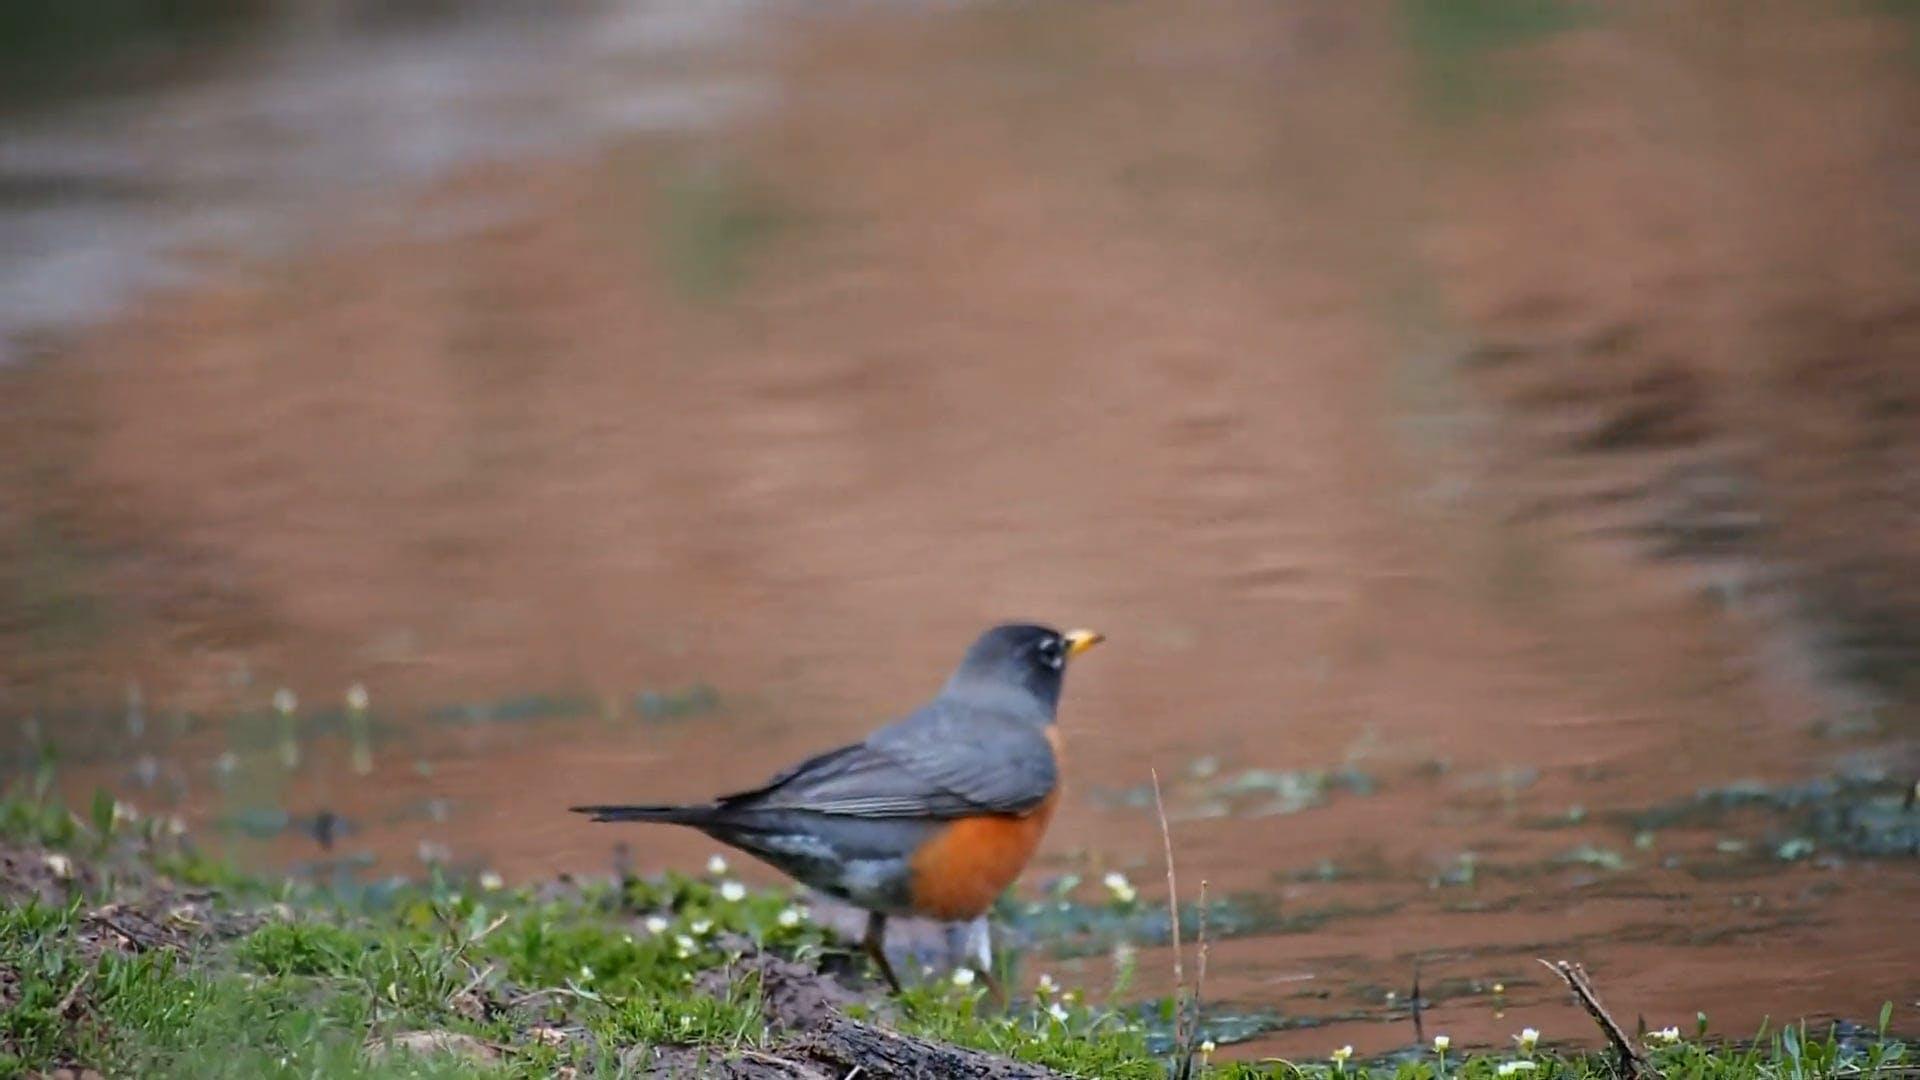 Black Bird Hopping Around Near a Body of Water